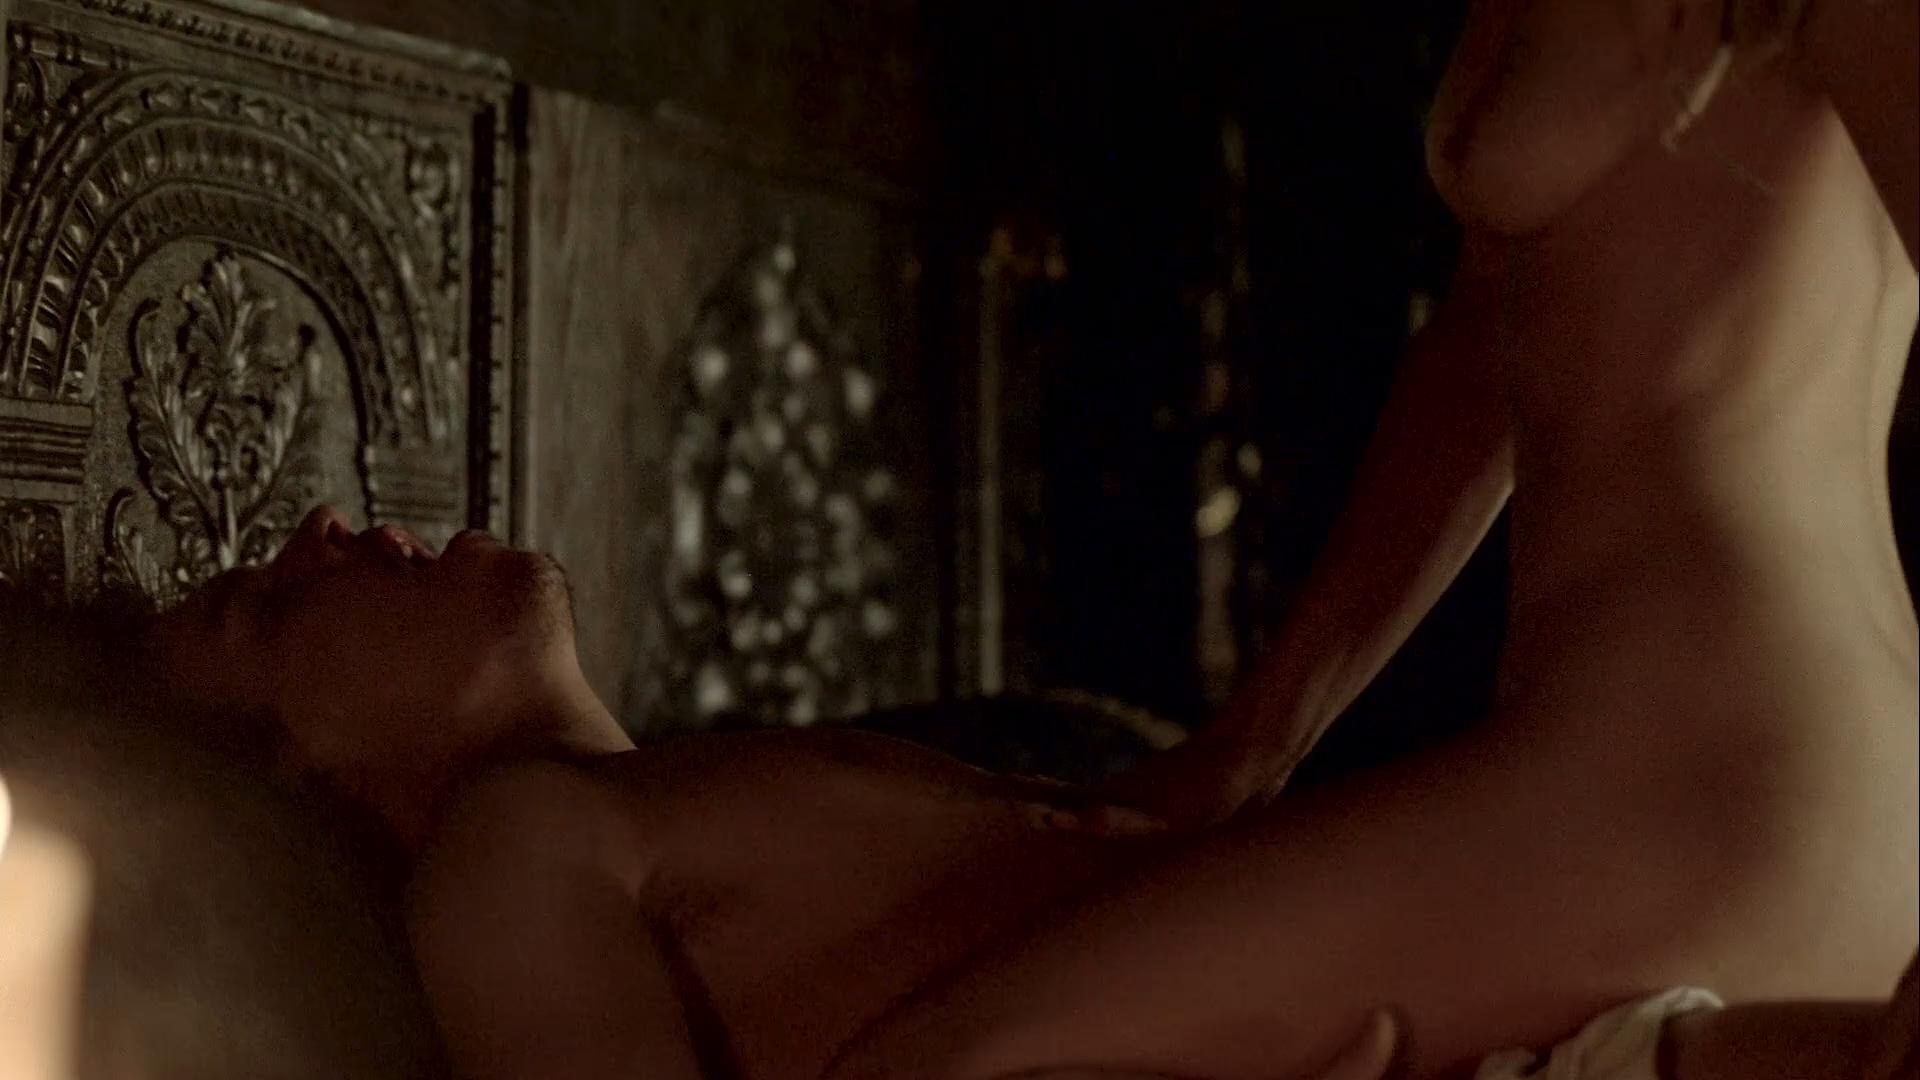 Henry cavill sex scene in the tudors